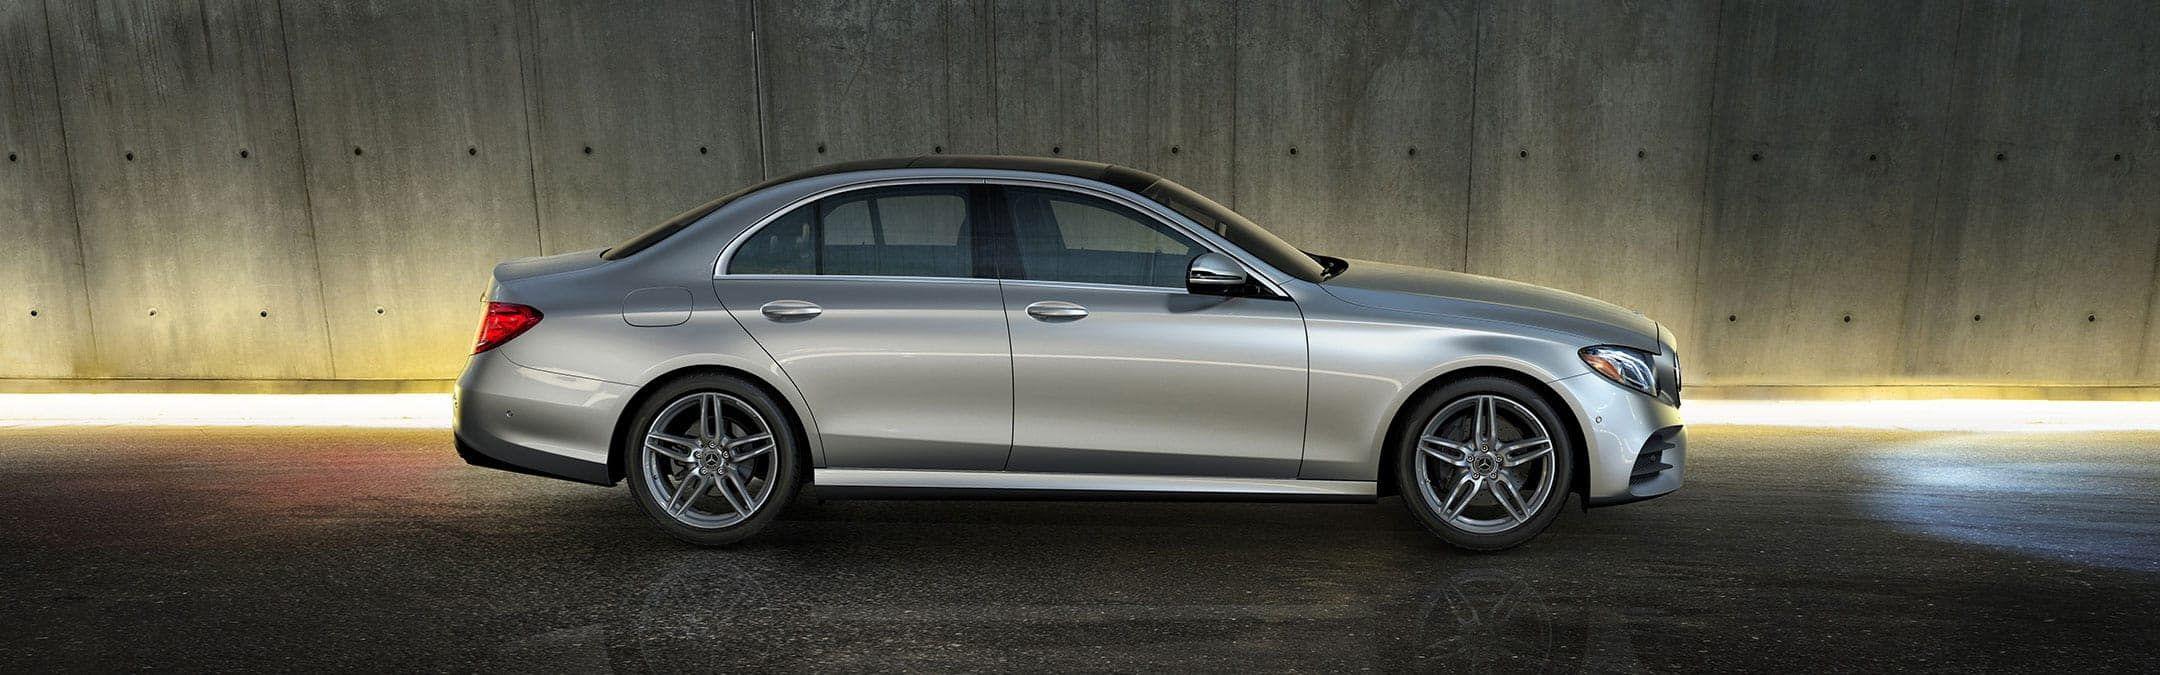 Mercedes Benz Dealership Jacksonville Fl for Free – Pixeles